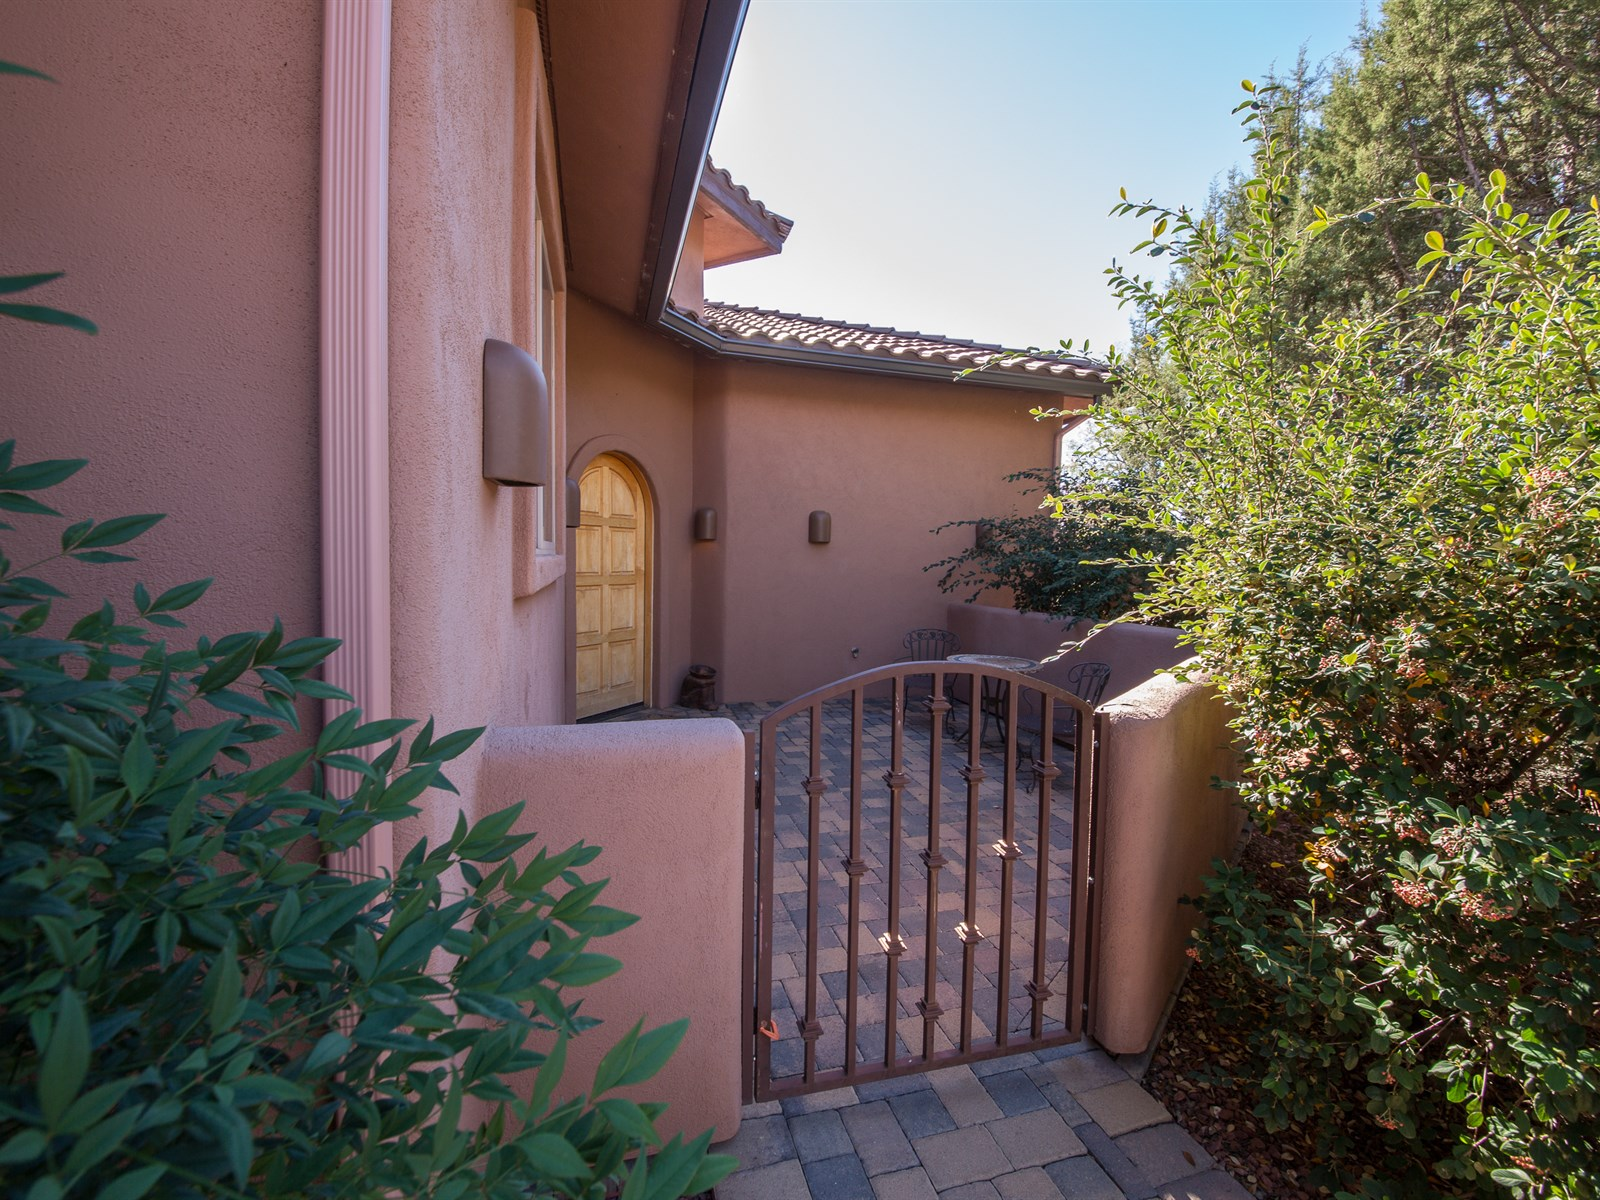 Moradia para Venda às Elegant Sedona Home 10 N Roan Court Sedona, Arizona 86336 Estados Unidos